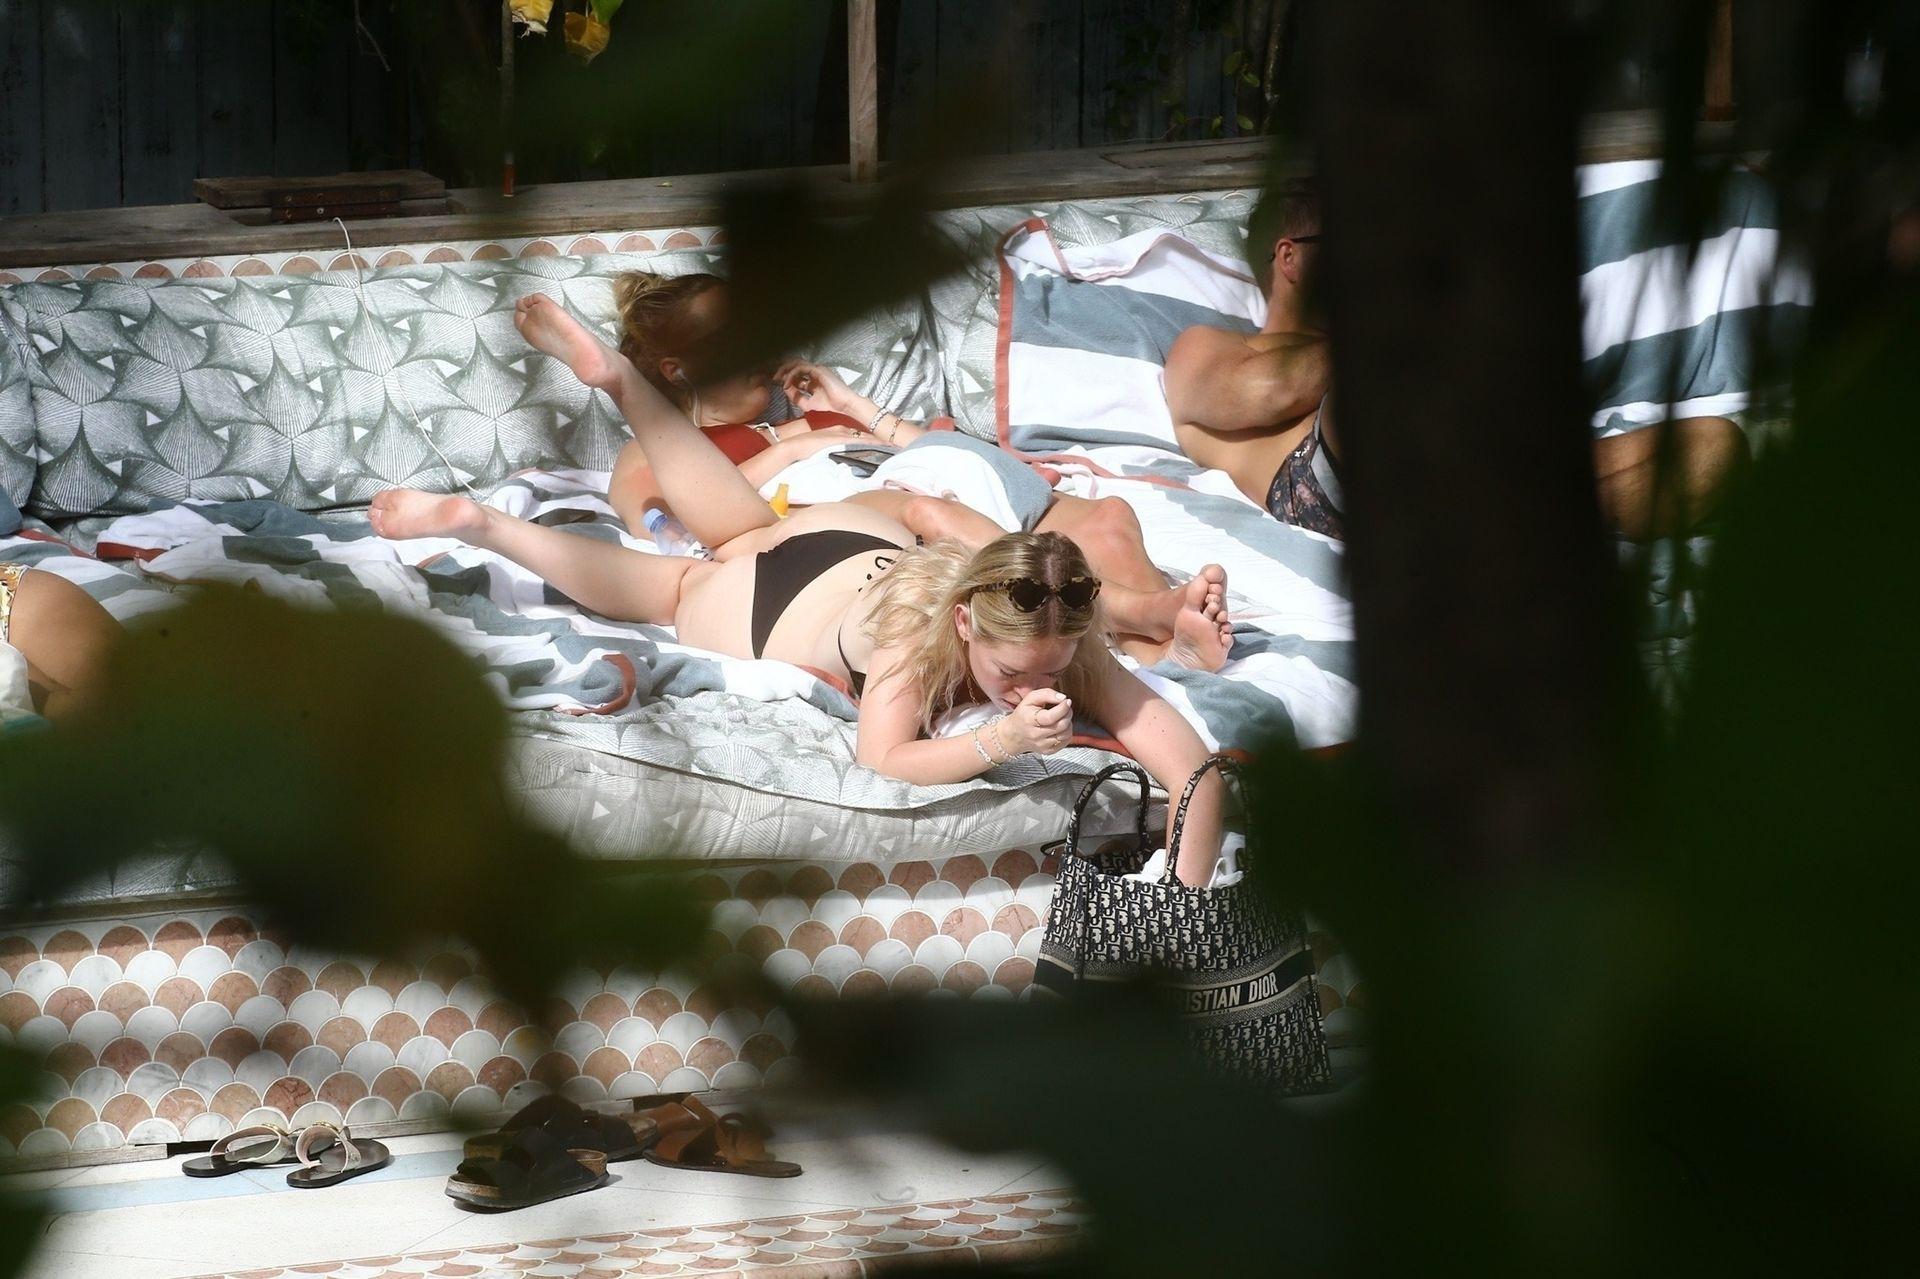 Tanya Burr Shows Off Her Figure In A Bikini 0022